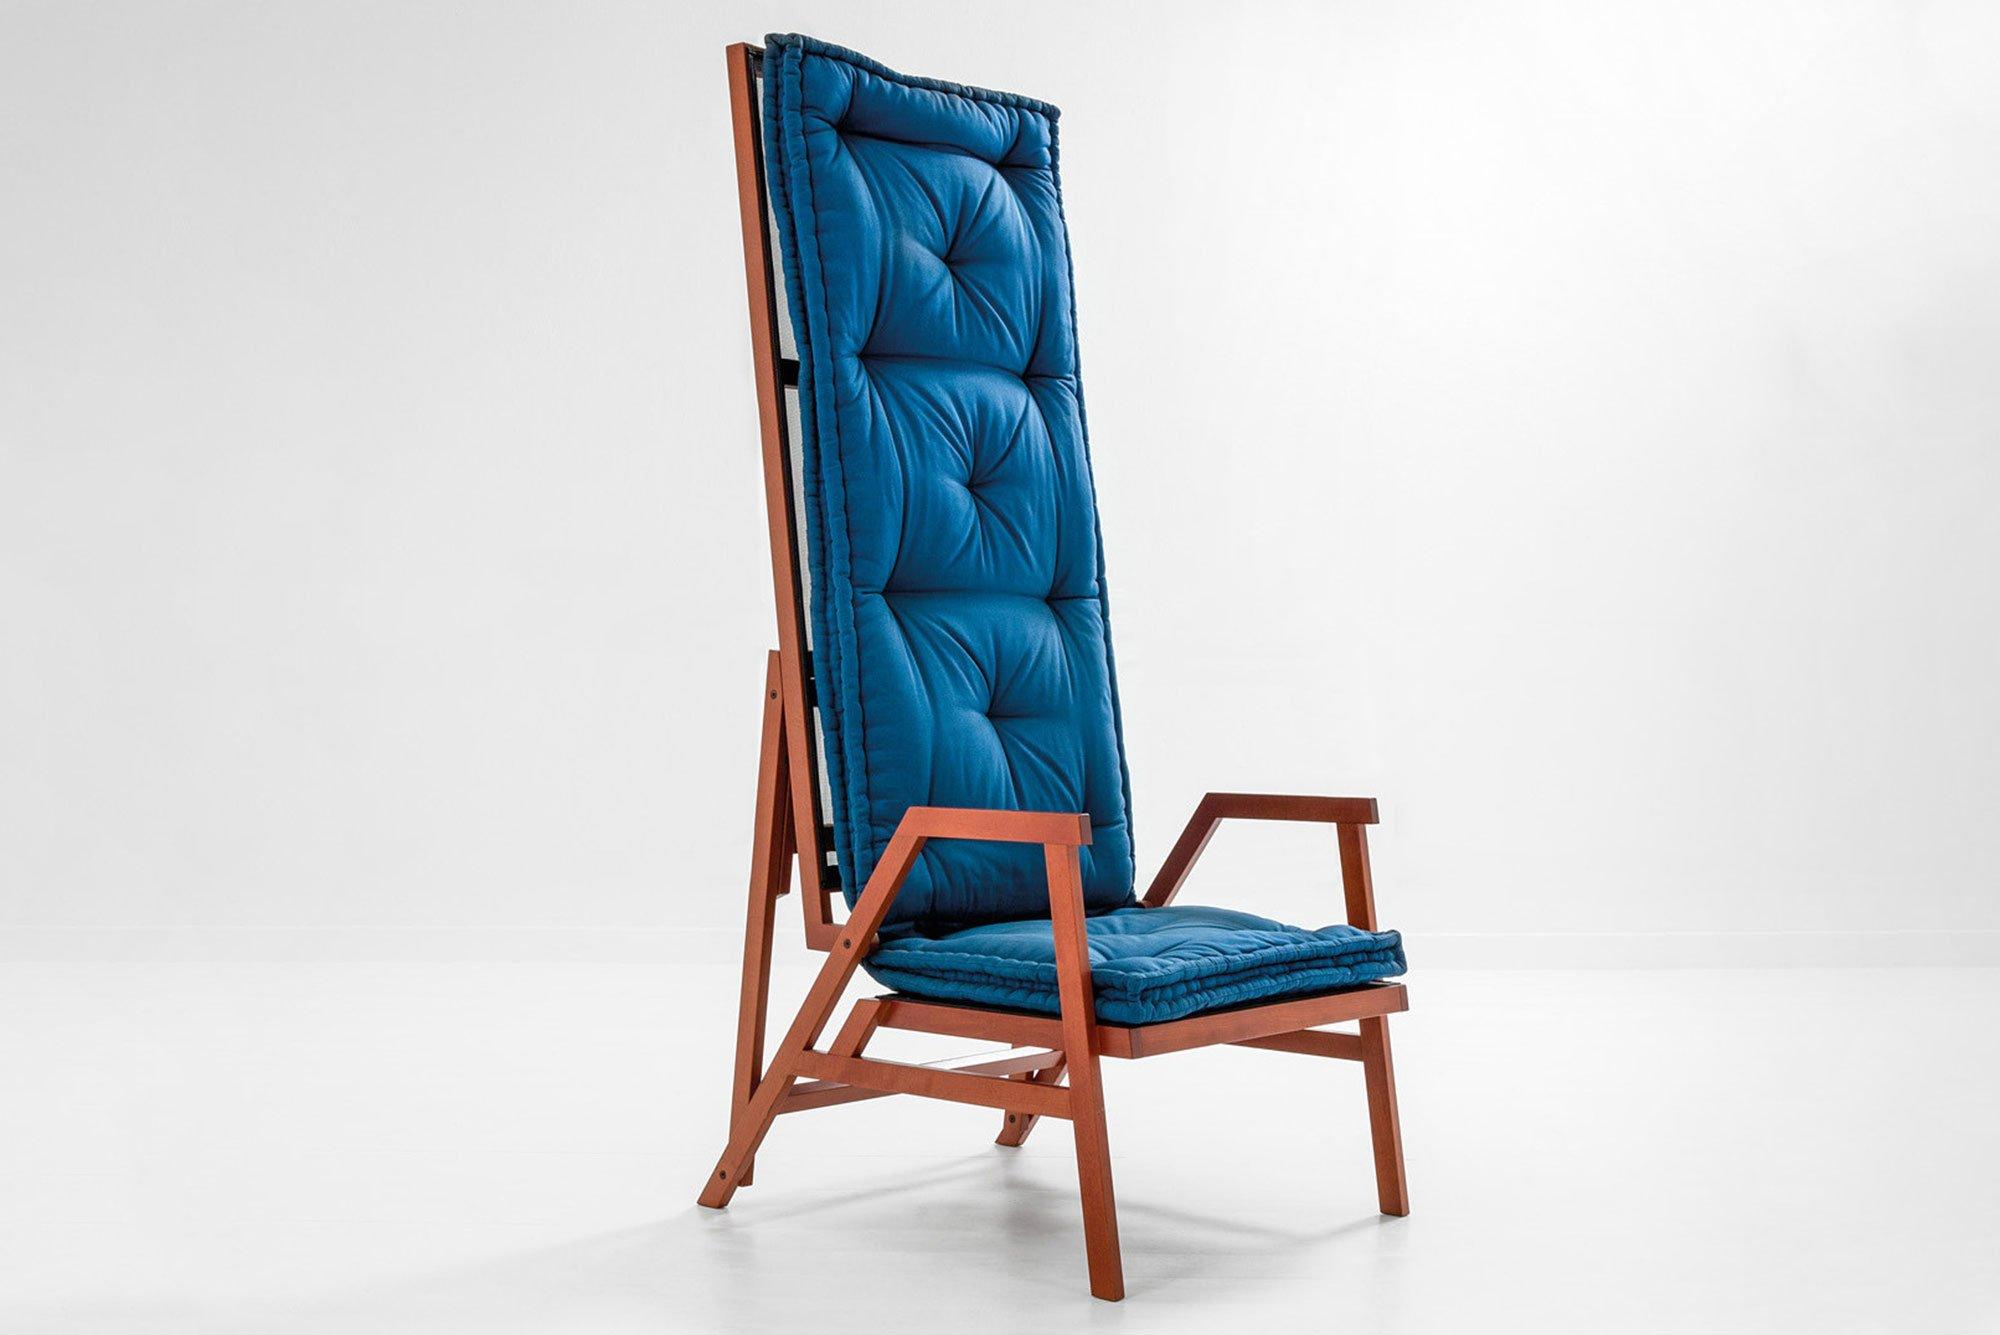 Armchair-bed mod. Polet